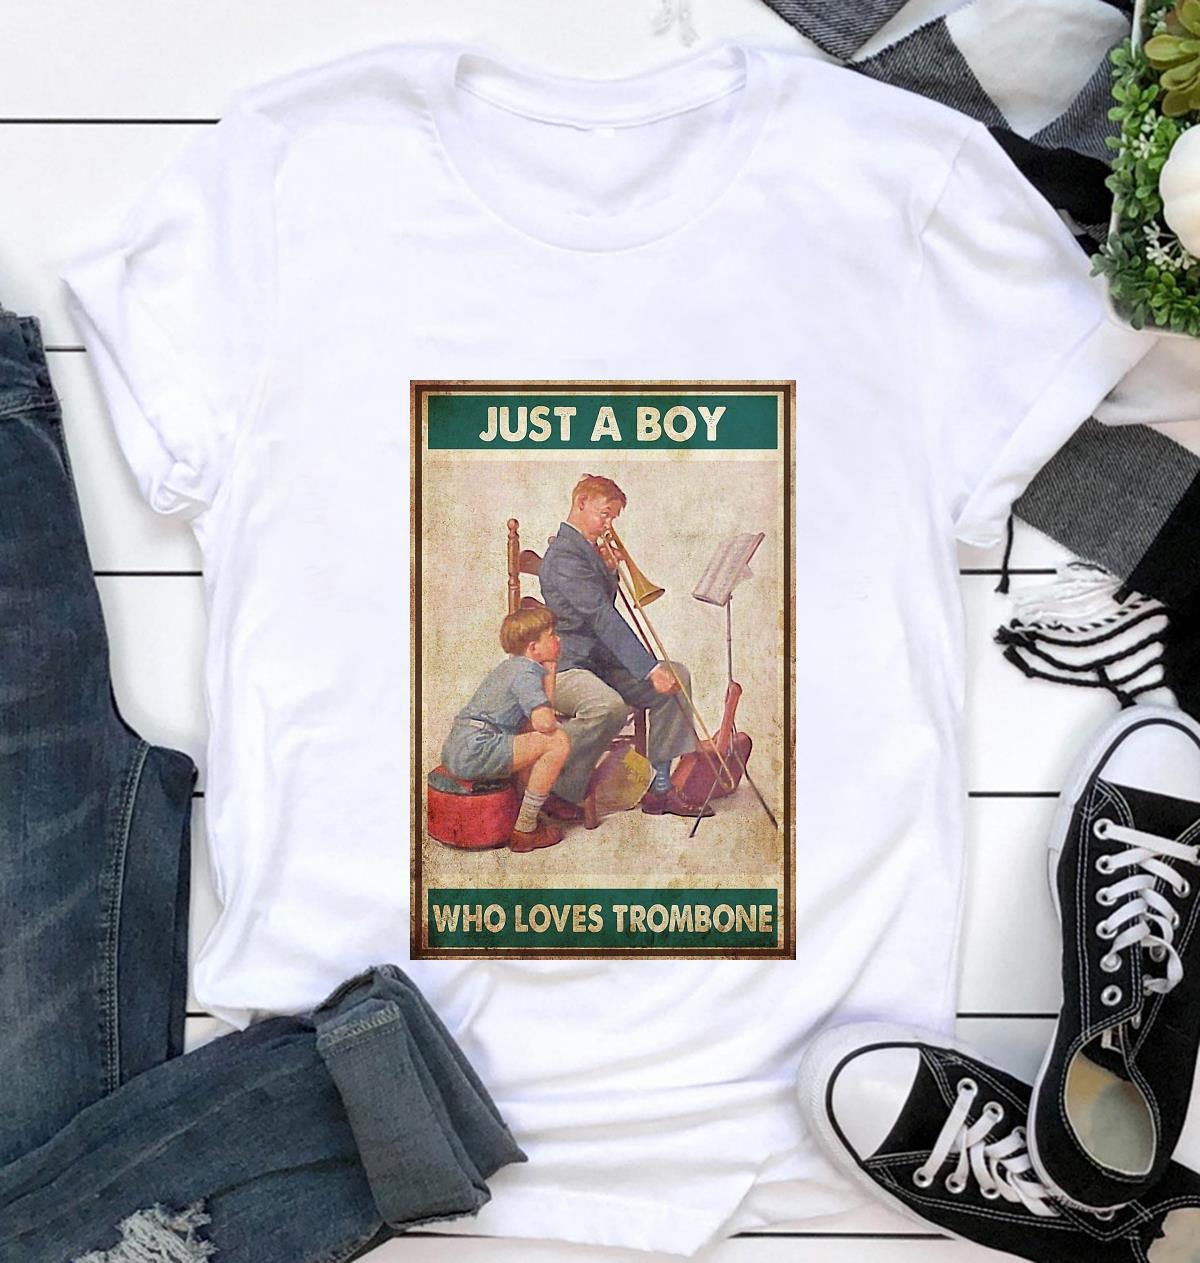 Just a boy who love trombone poster t-shirt